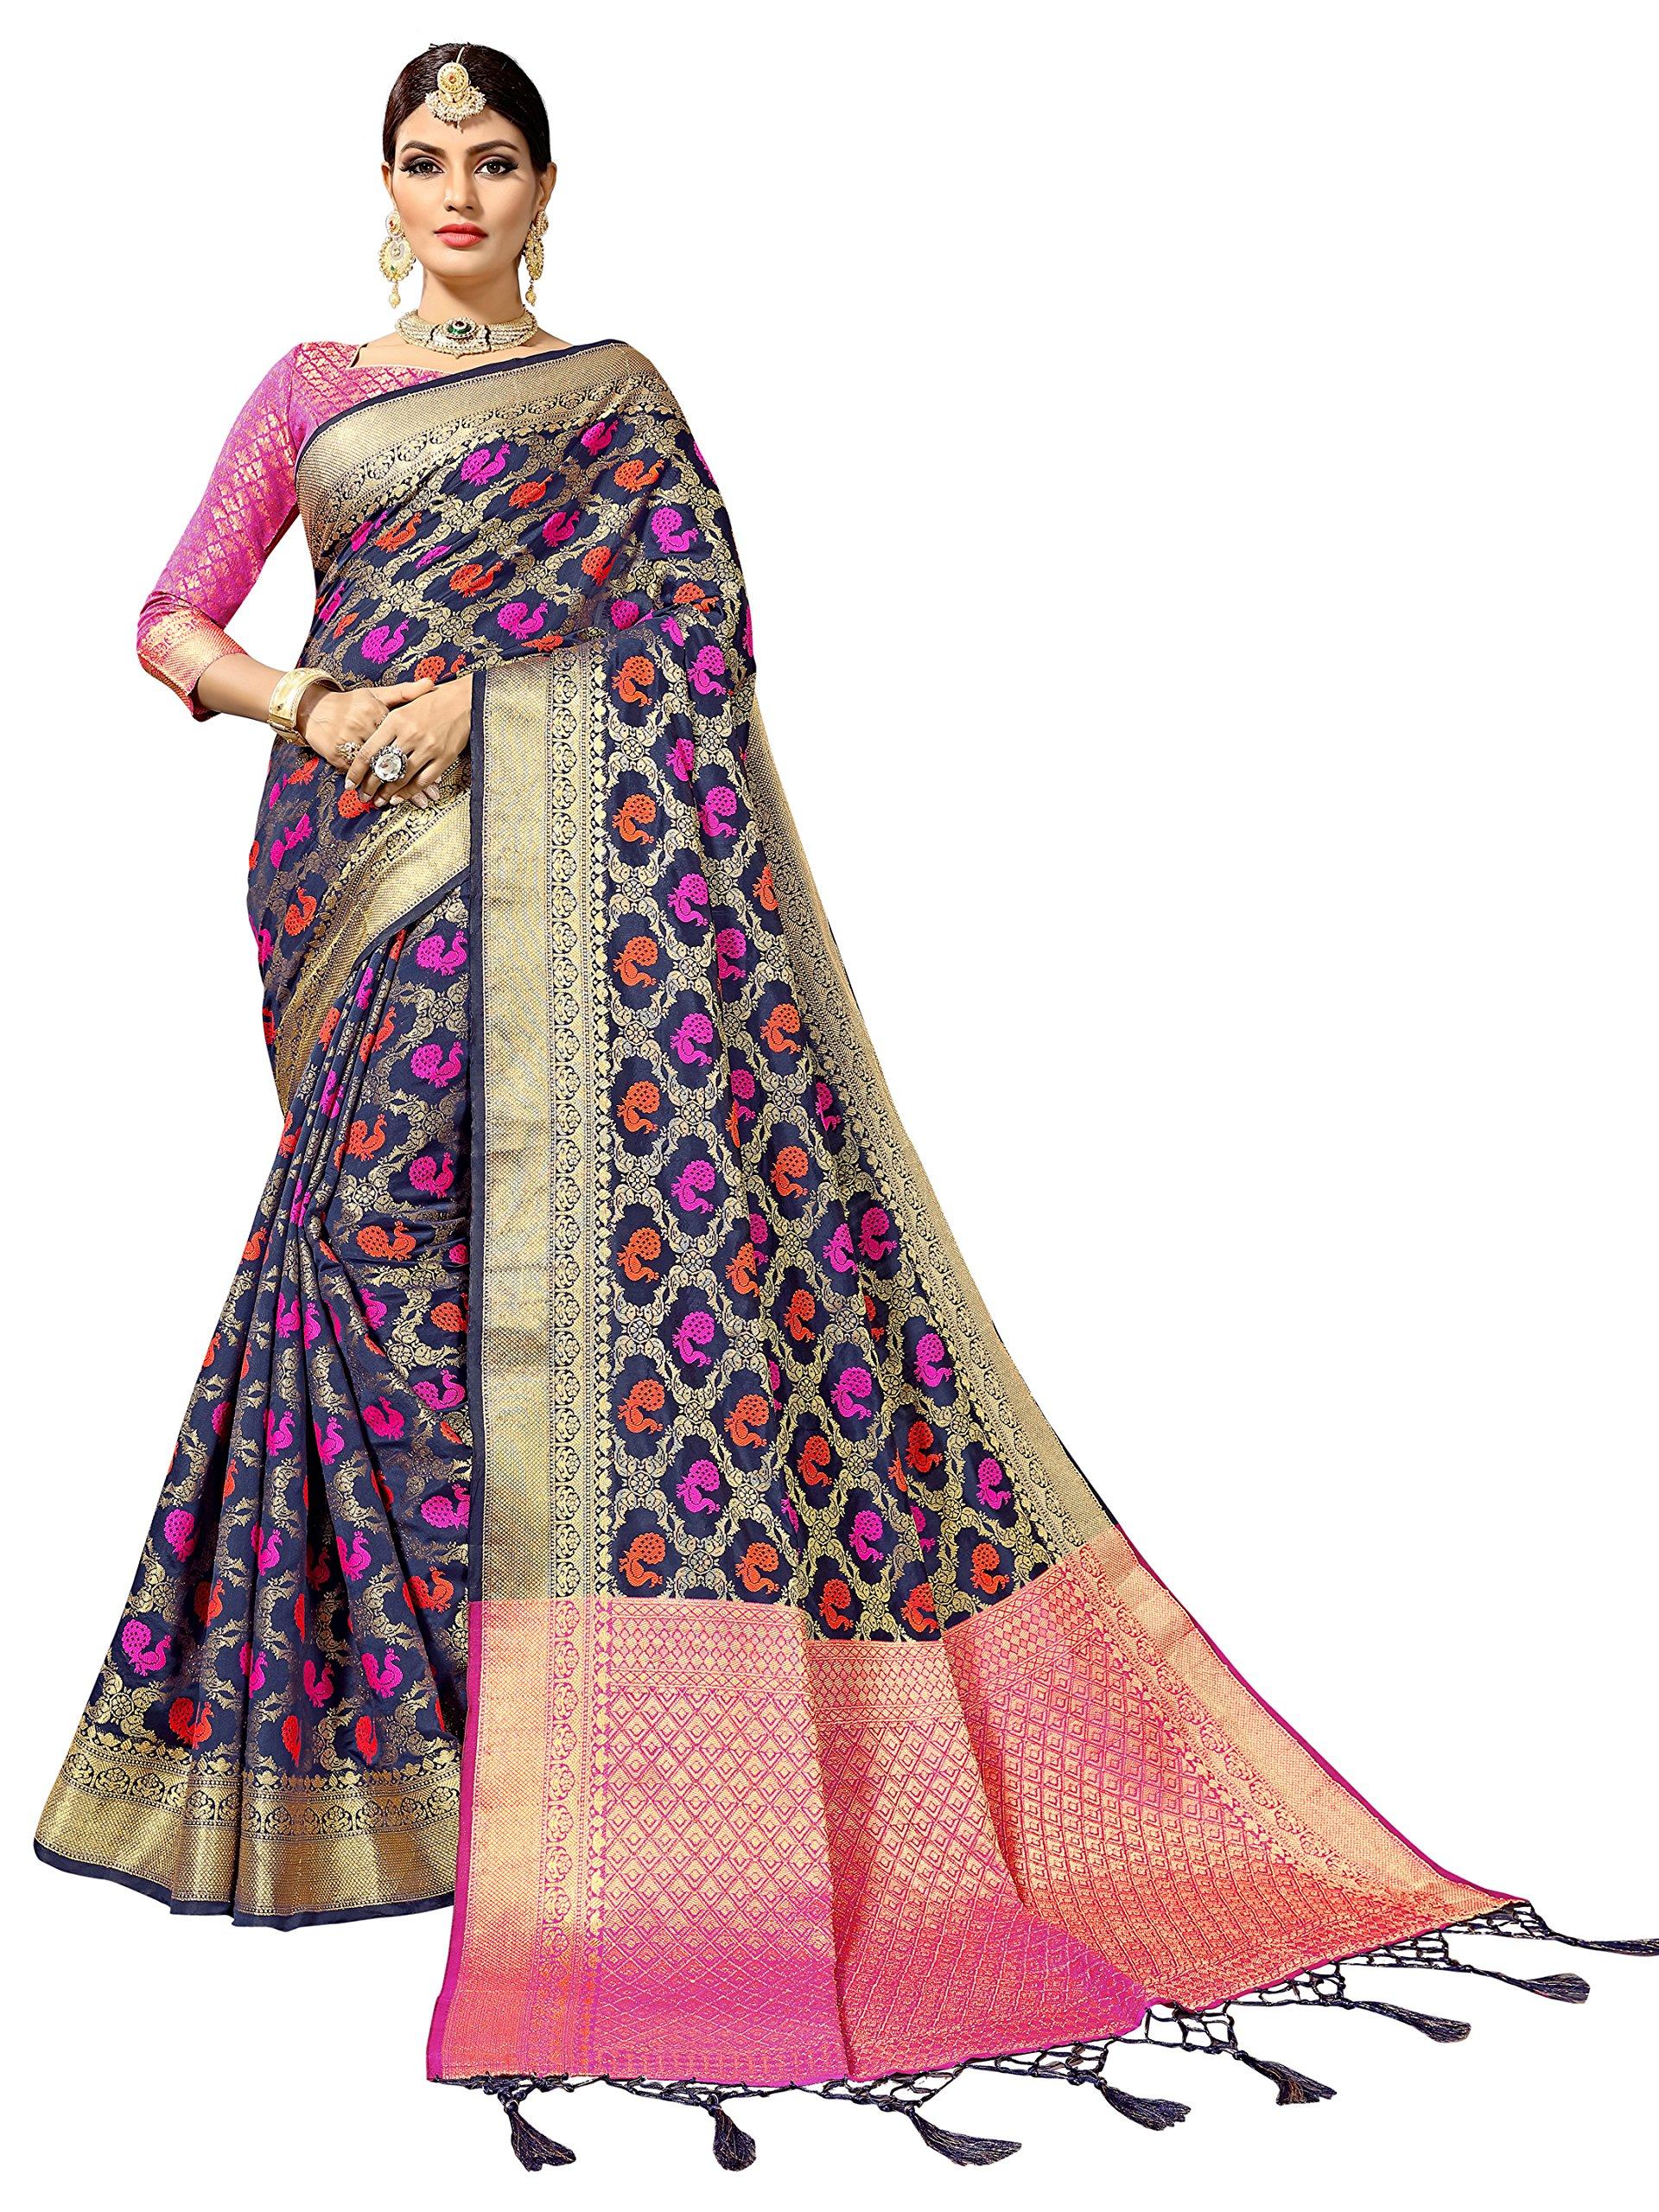 Women's Art Silk Woven Patola Indian Sari Wedding Self Design Saree (6837_Blue)